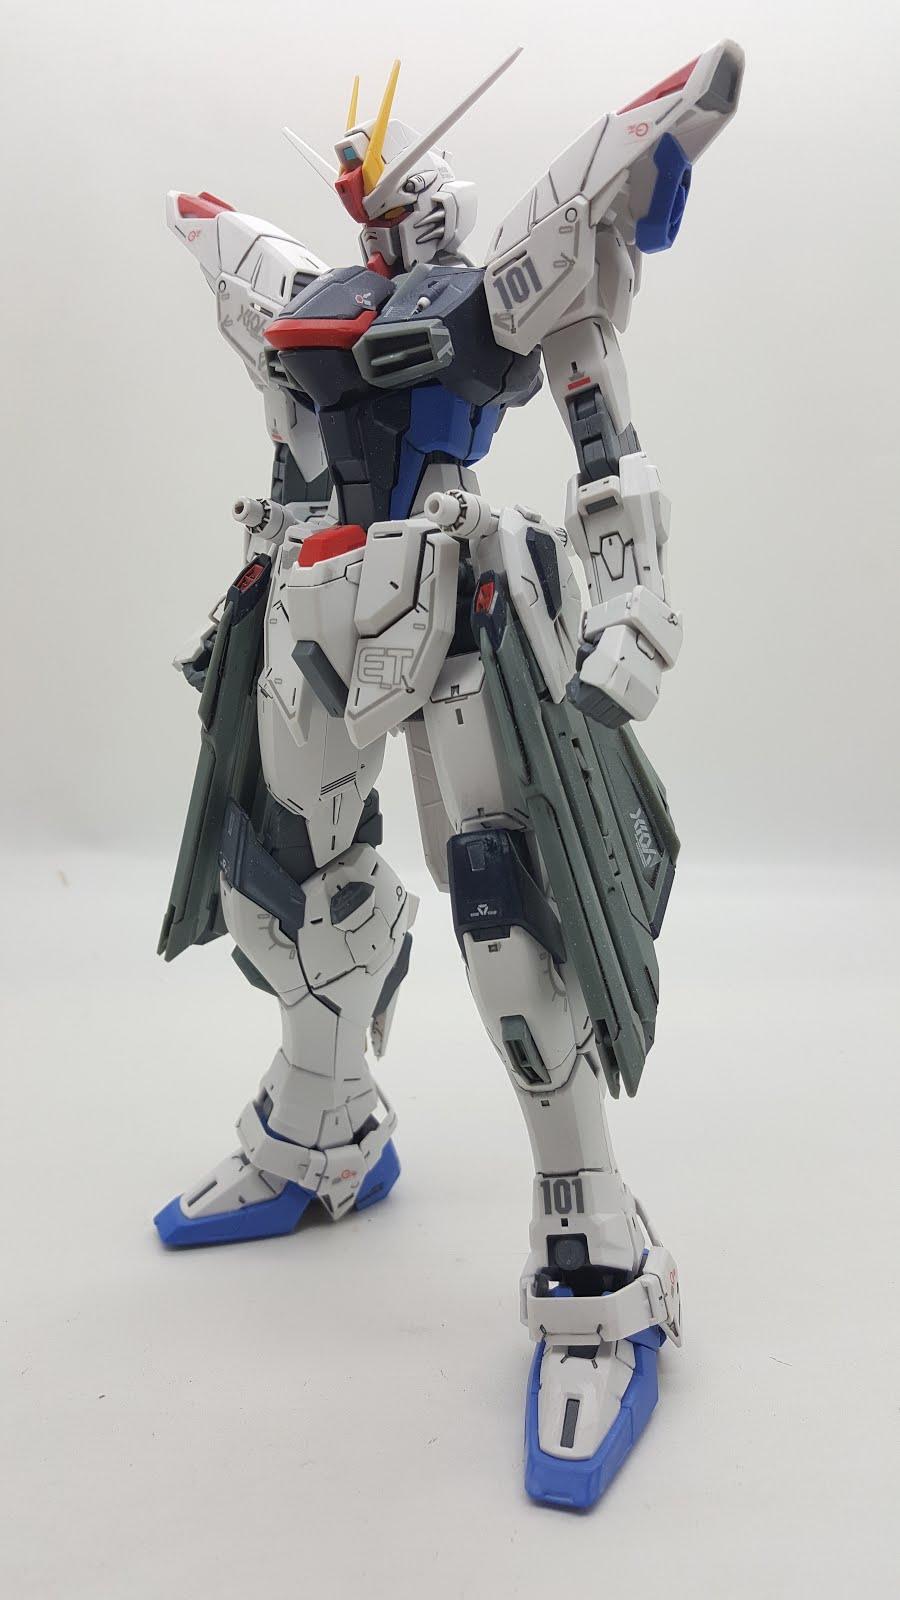 Mg 1 100 Scaled Freedom Gundam 2 0 Review Gundam My Blog